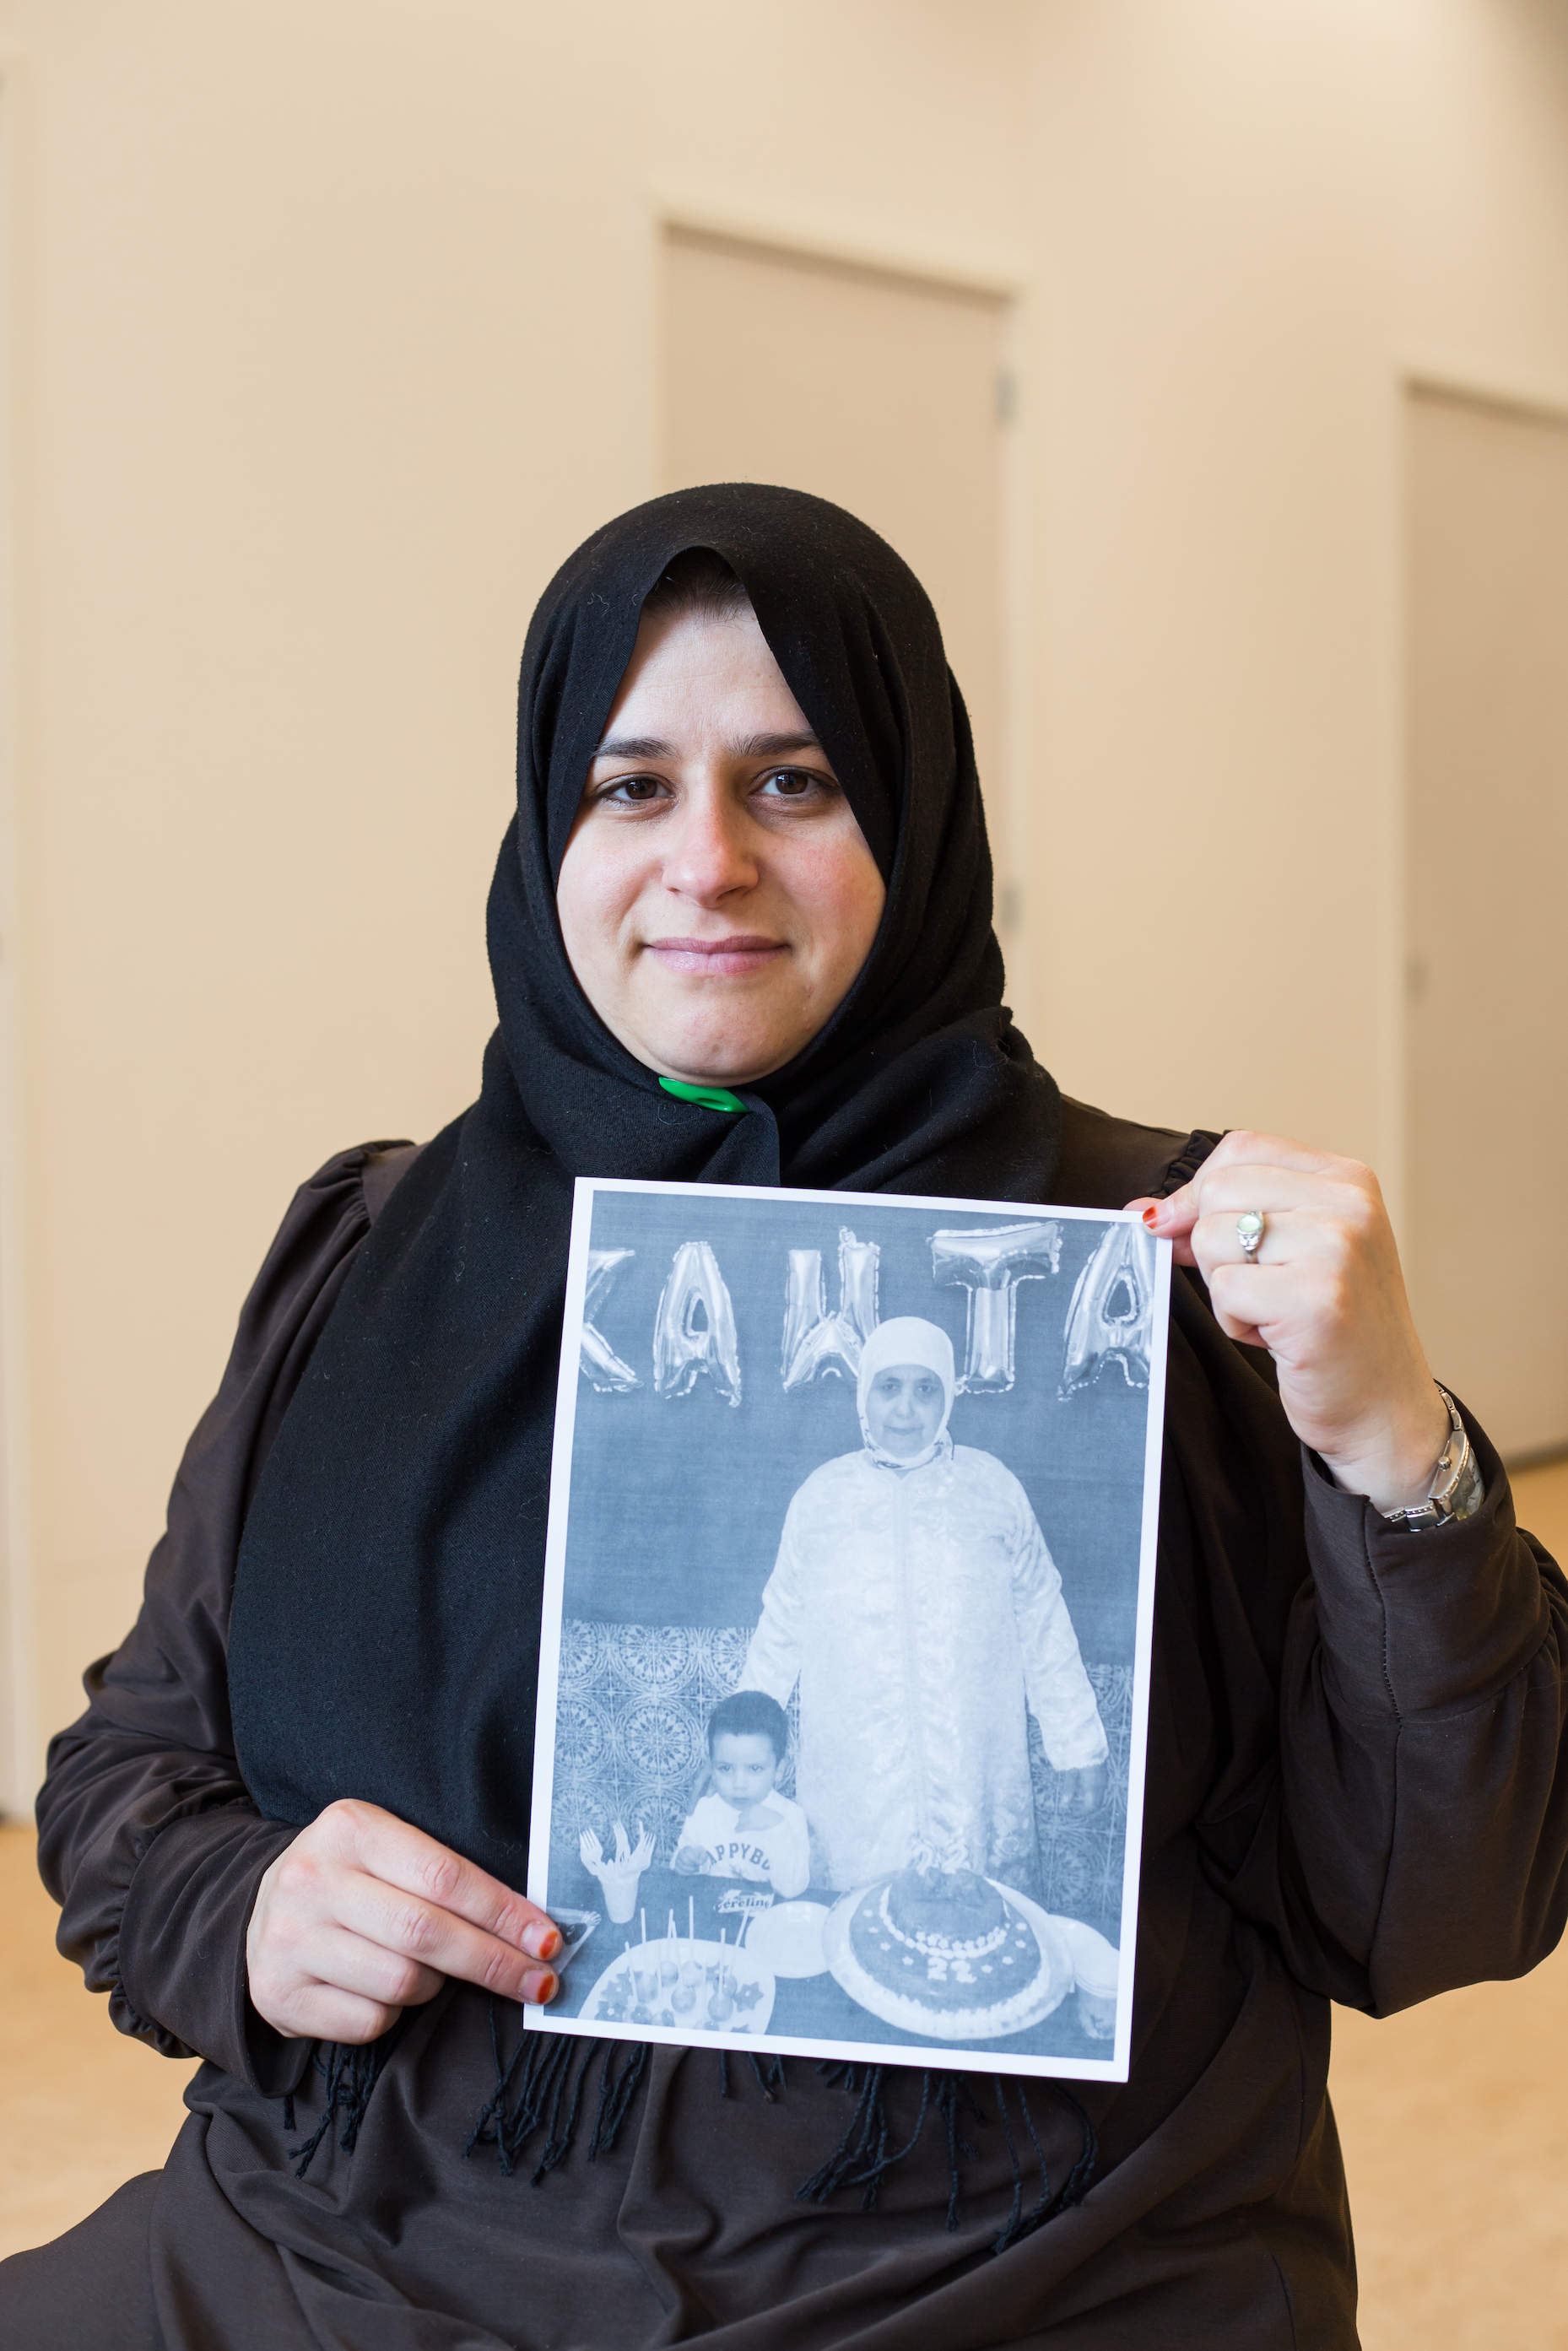 Karima Abouchdak